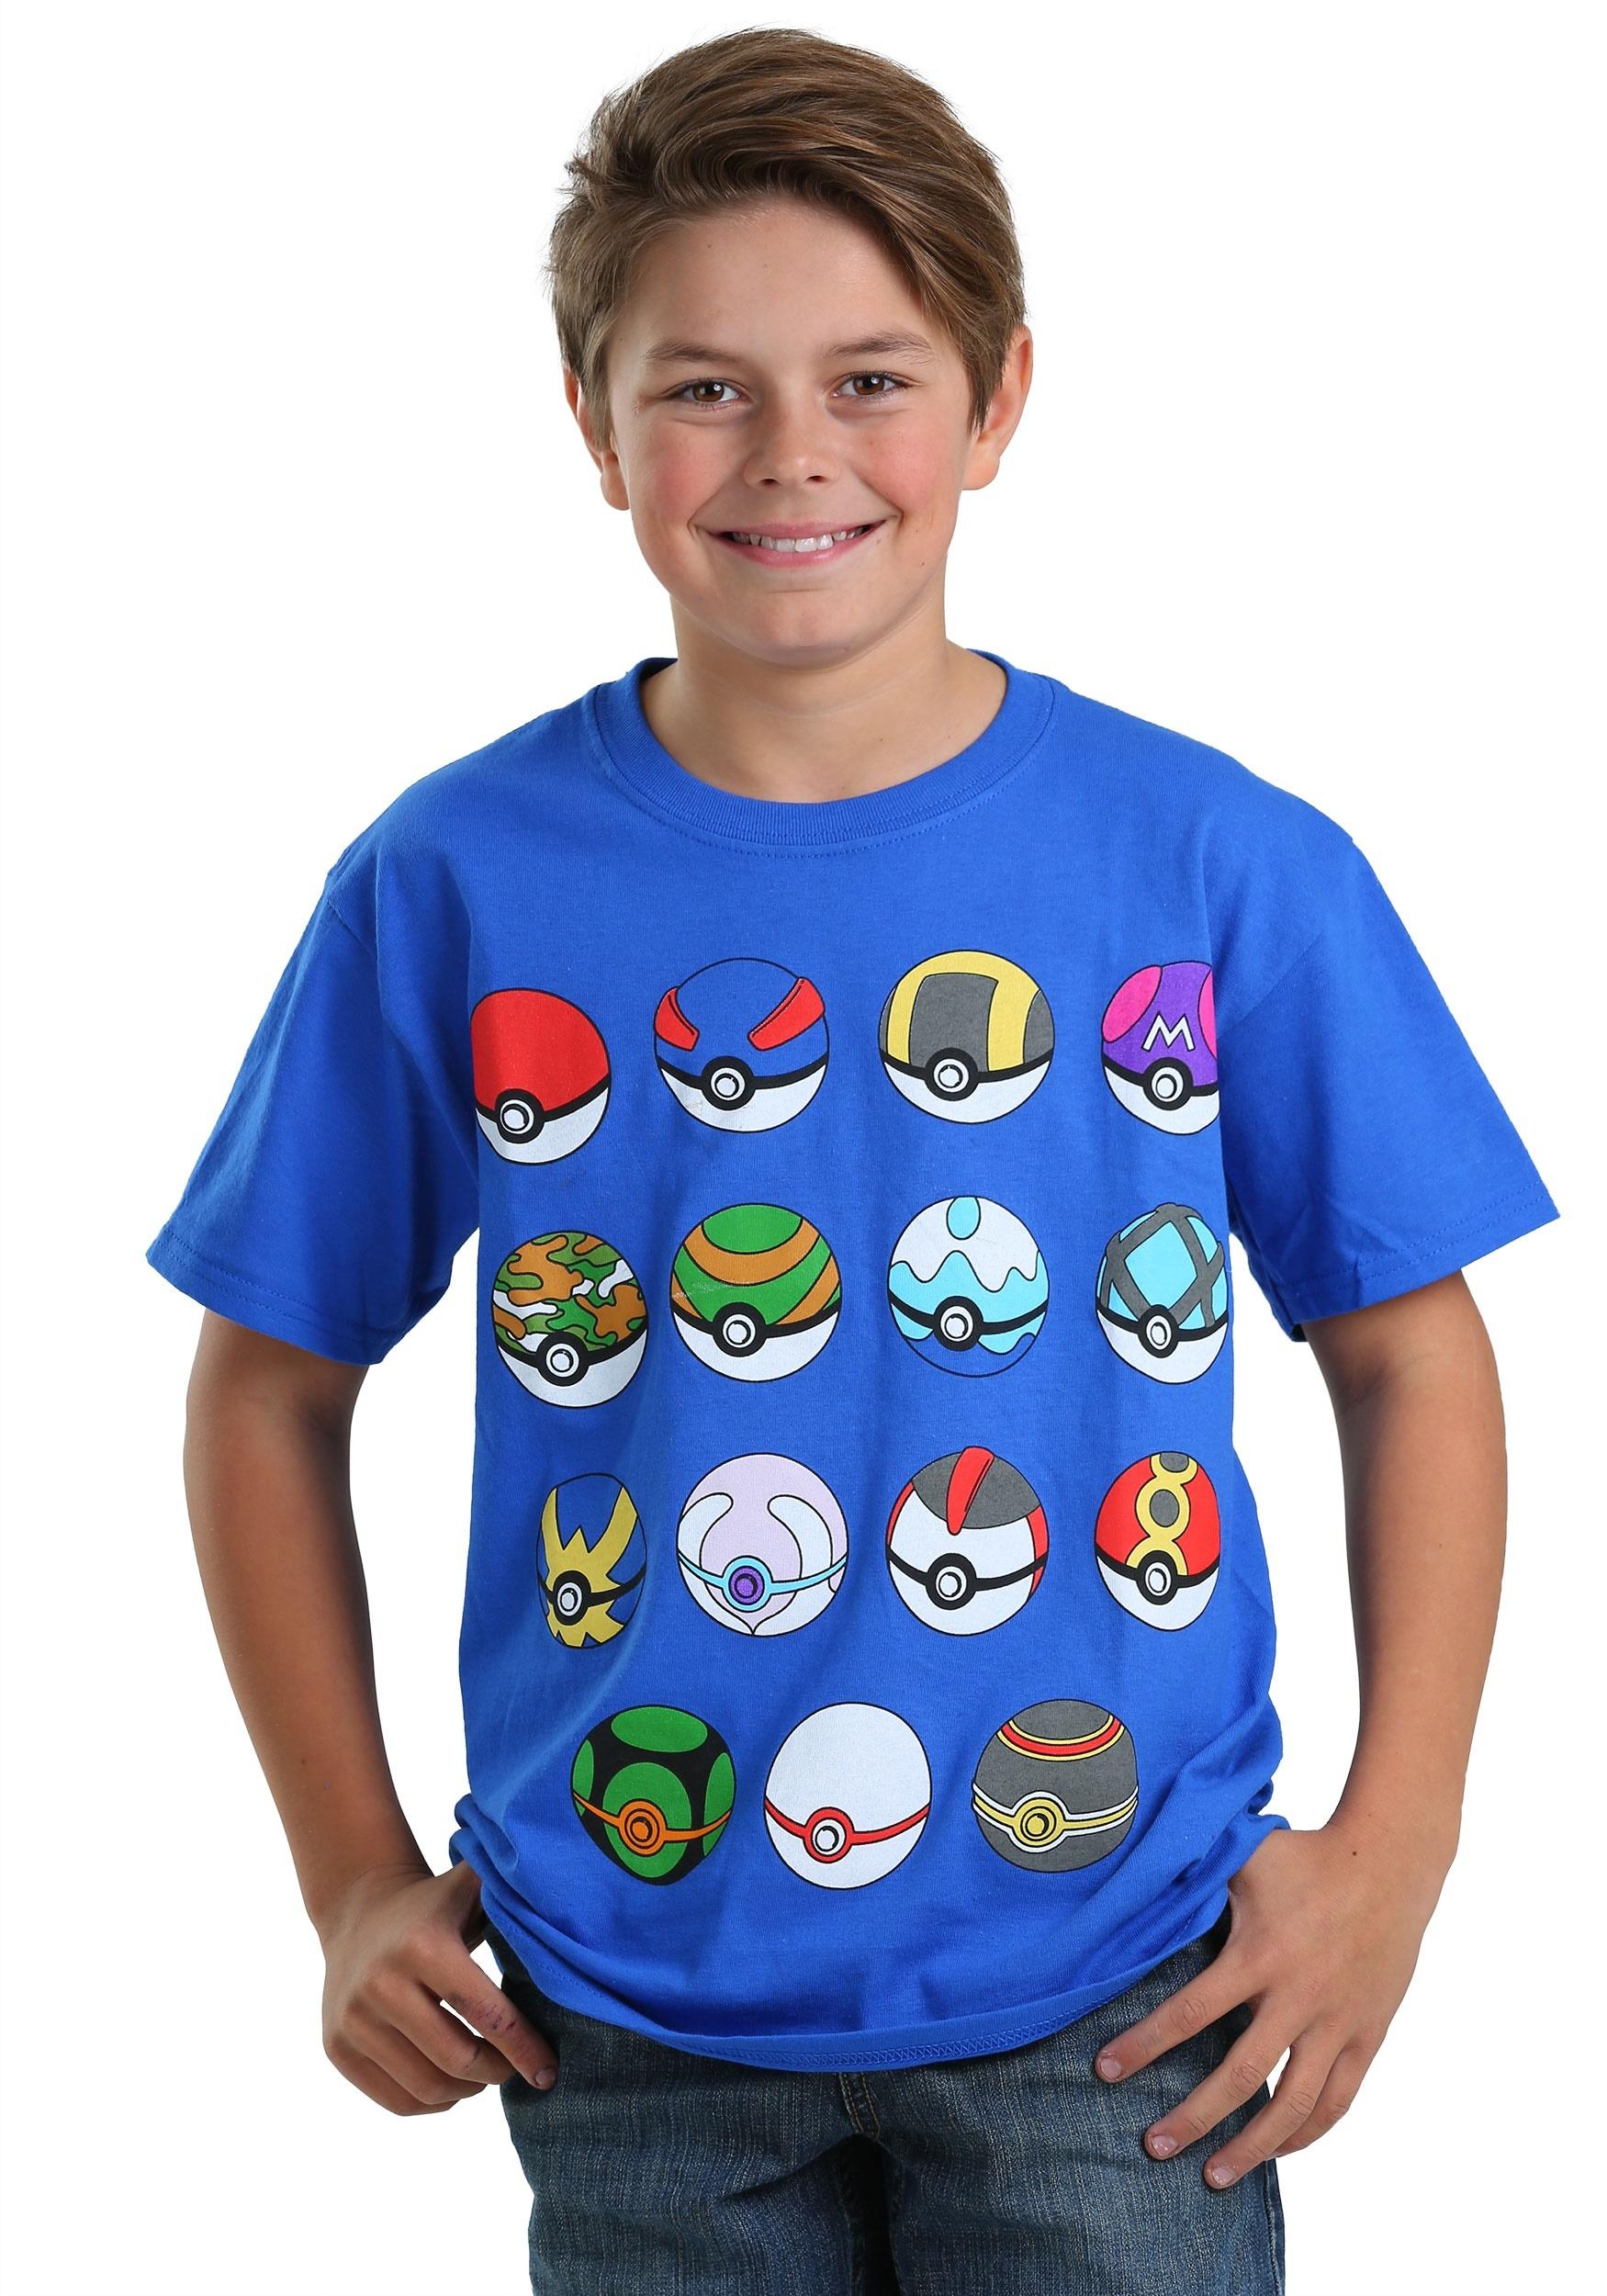 64d2d33e Boys Pokeball Tee from Pokemon